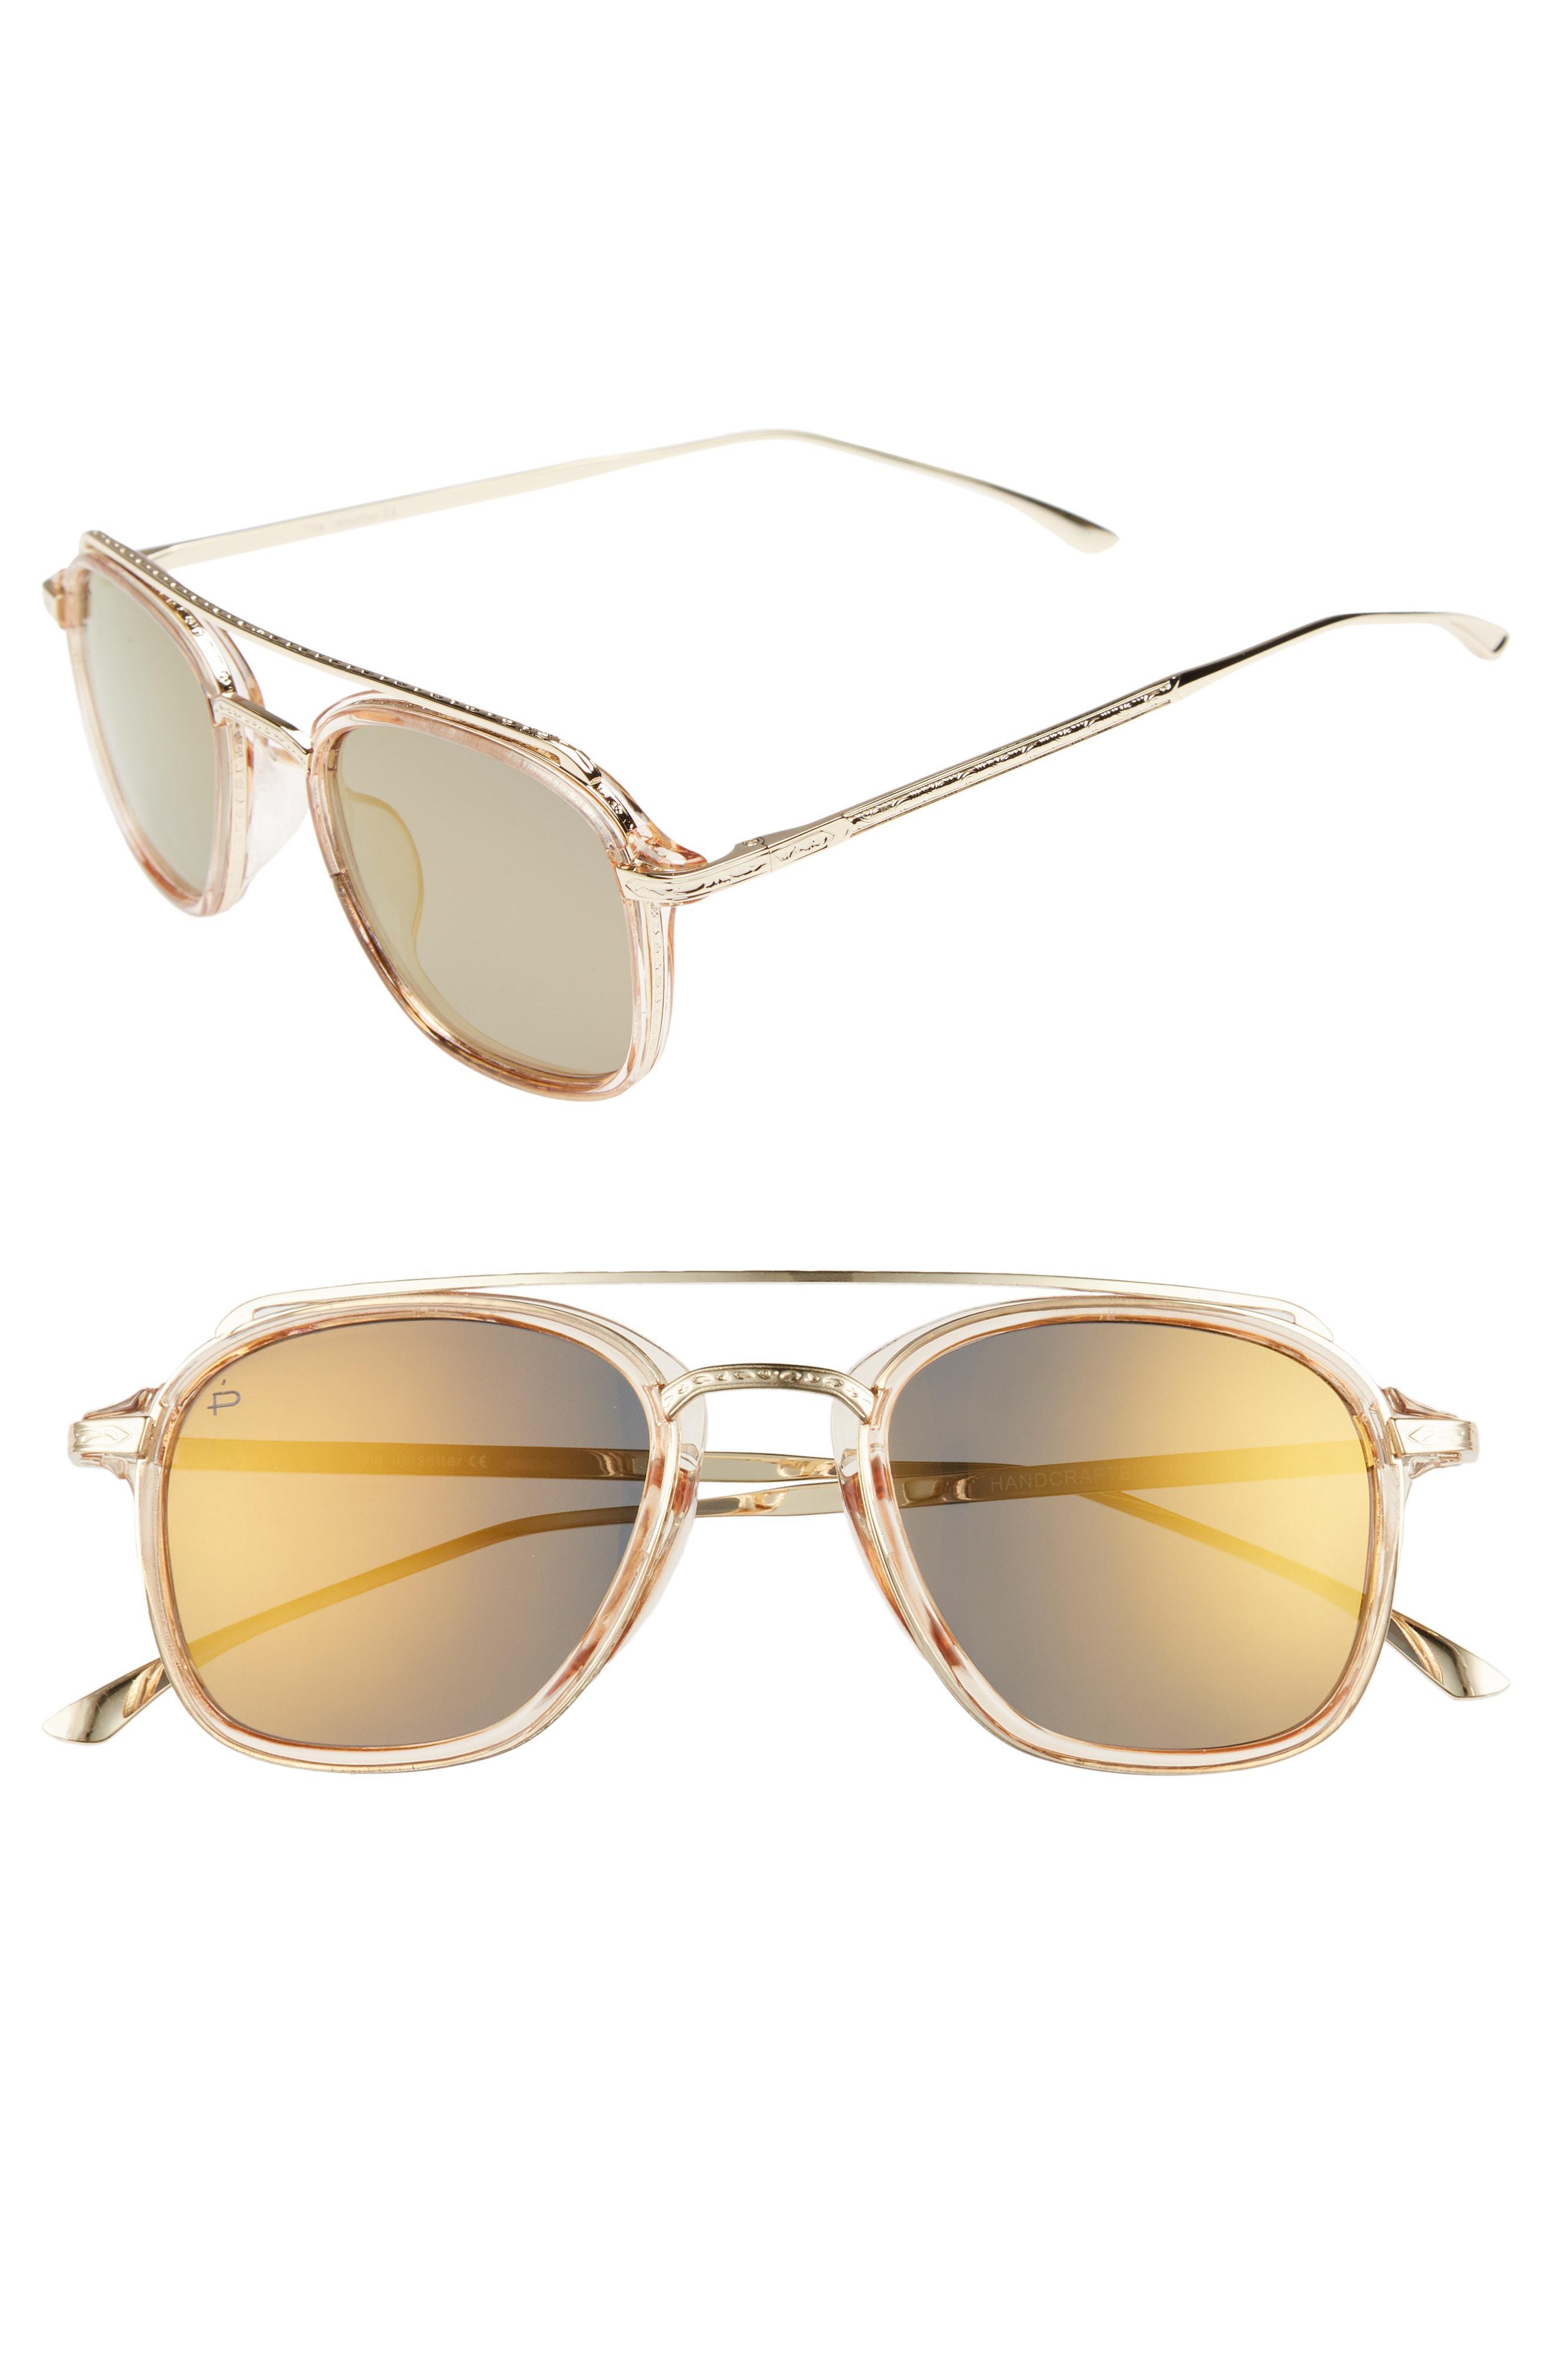 106bc243d5c1f Privé Revaux. Men s Metallic The Jetsetter 45mm Polarized Sunglasses